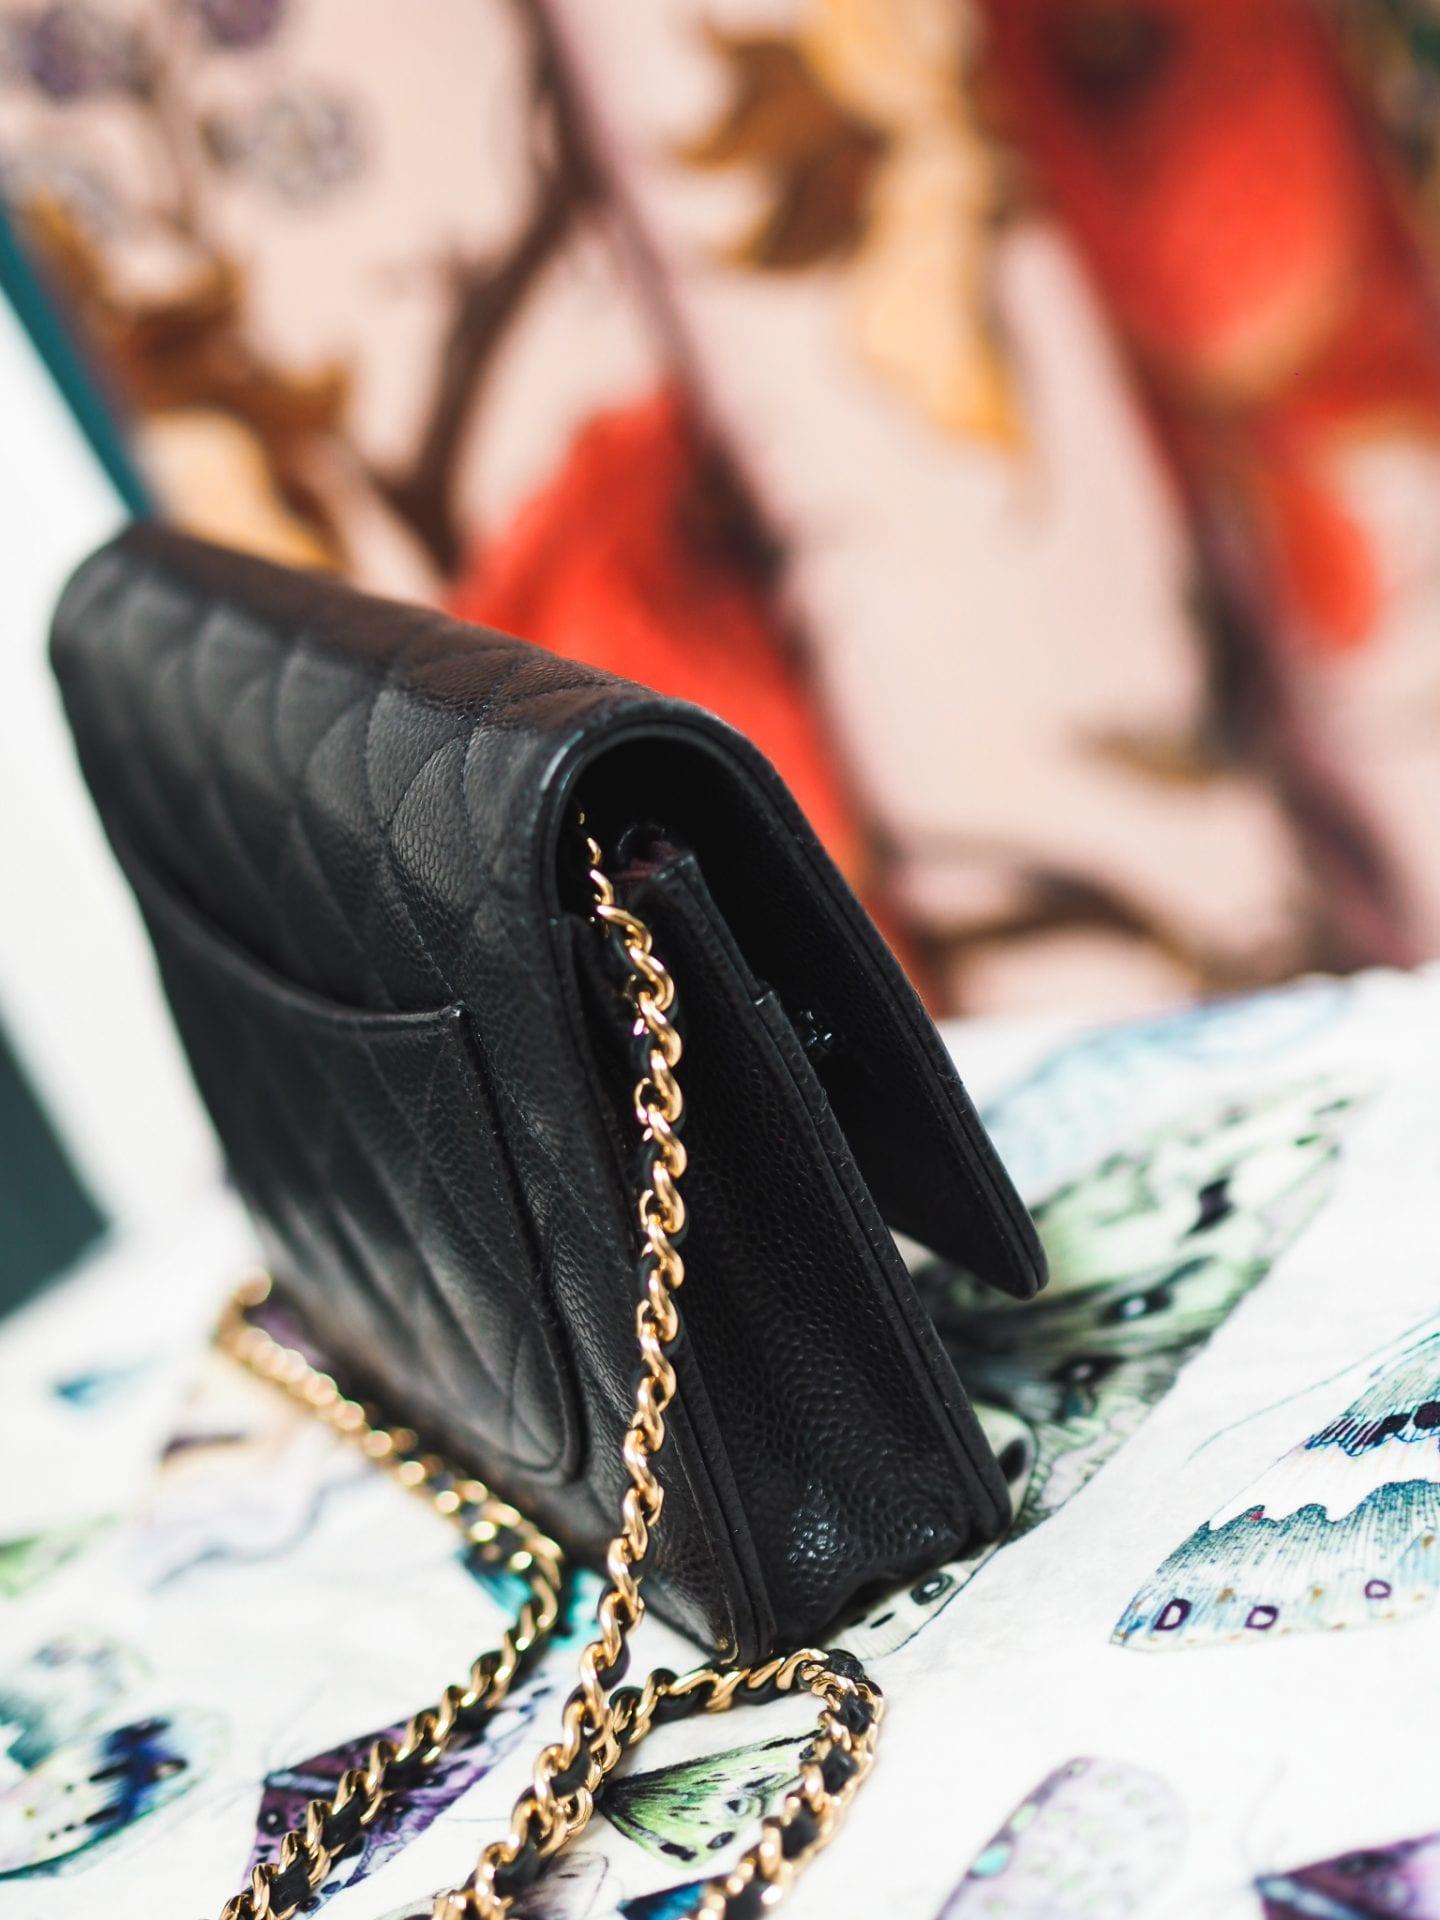 chanel wallet on chanel handbag black caviar leather fashion for lunch blog chanel WOC lambskin